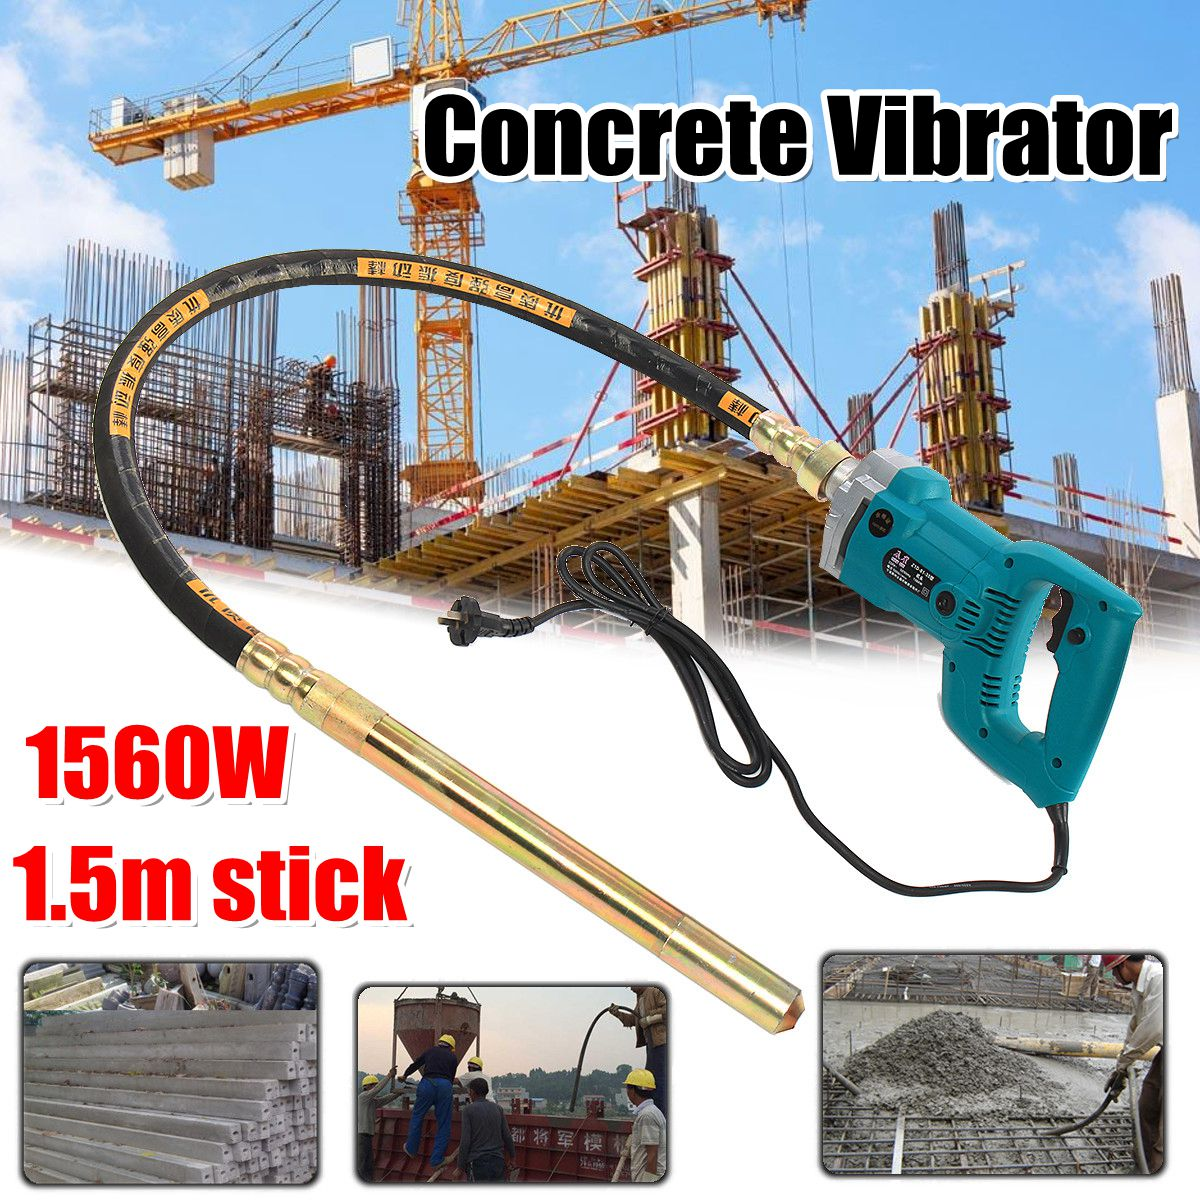 800W/1200W/1560W Concrete Vibrators Electric Cement Soil Mixer With Stick 3/4 HP- Heavy   Remove Air Bubbles & Level 5000 VPM